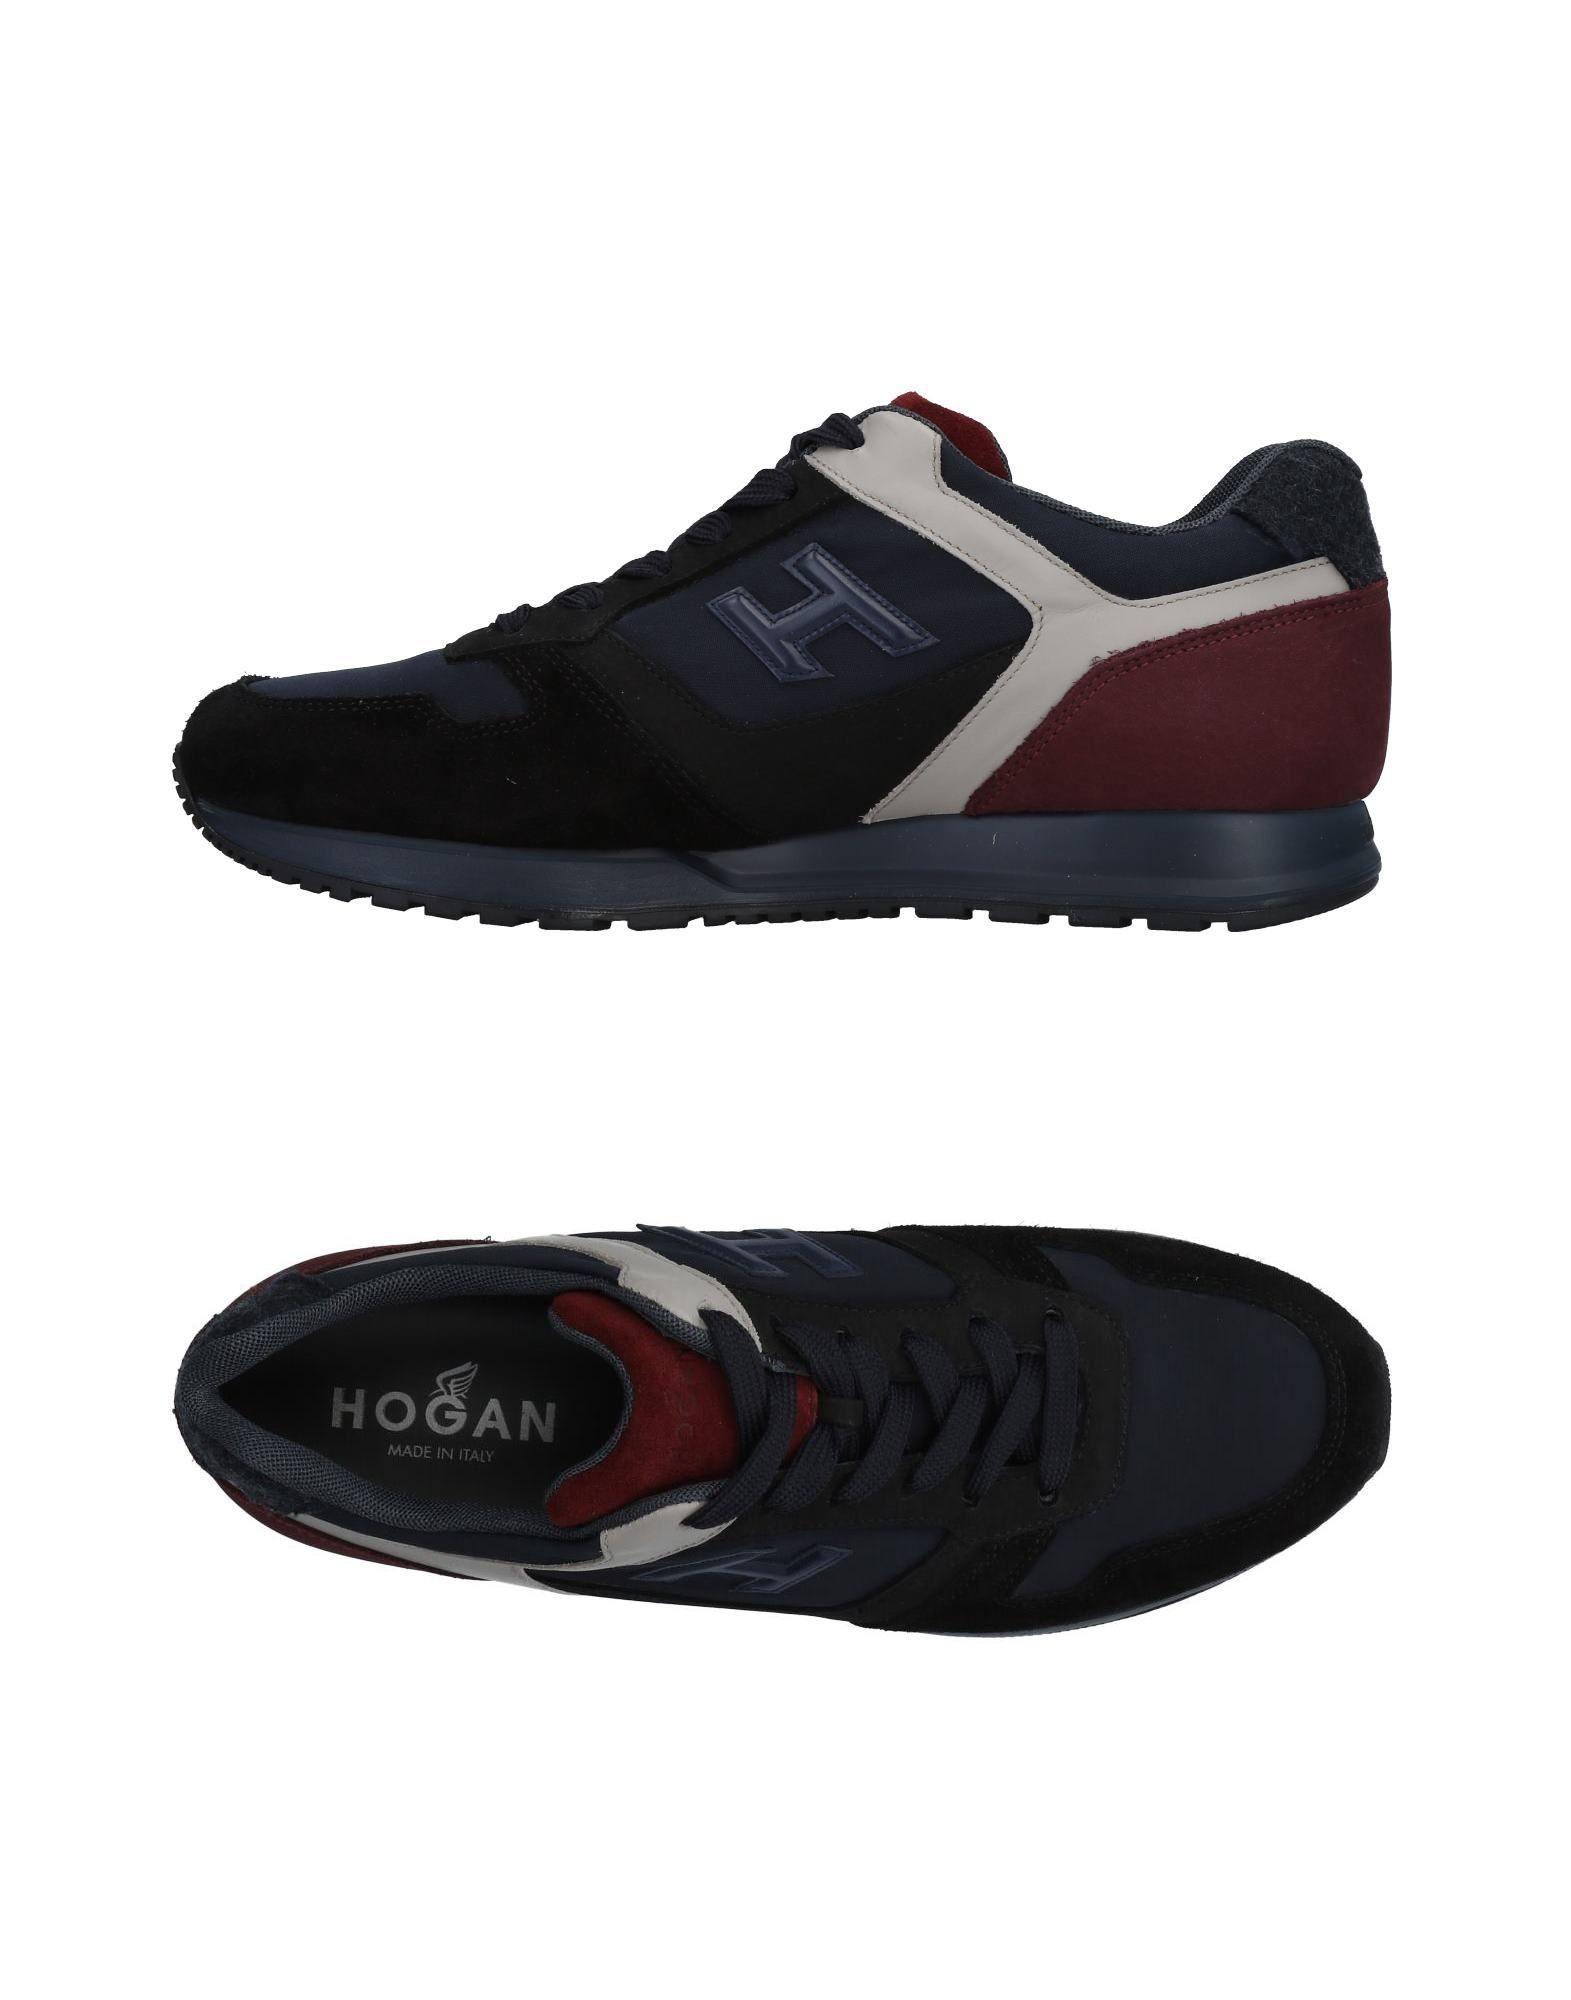 Hogan Sneakers Herren  11486075UF Gute Qualität beliebte Schuhe